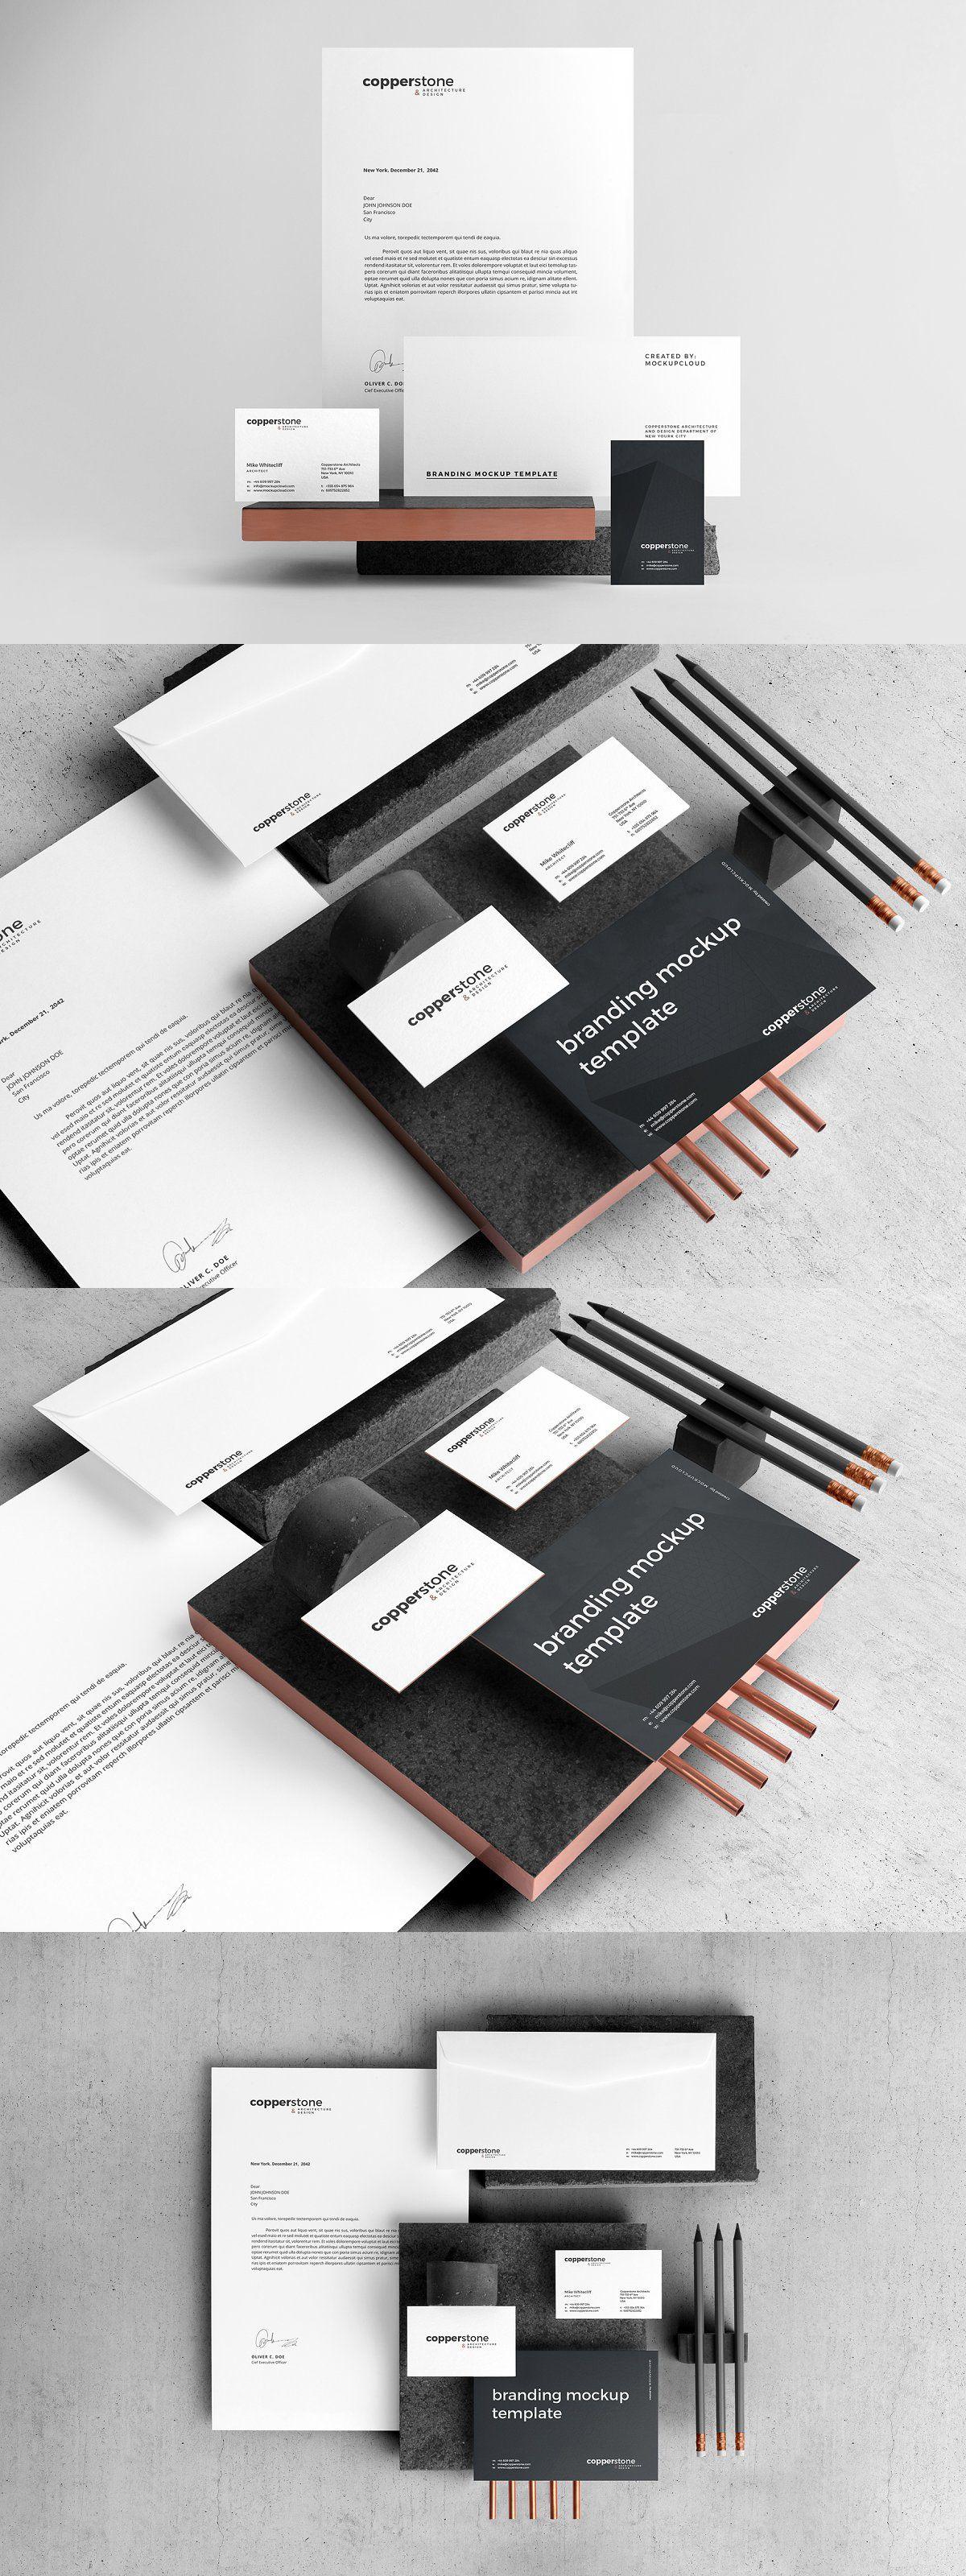 Branding Mockup Branding Mockups Branding Design Branding